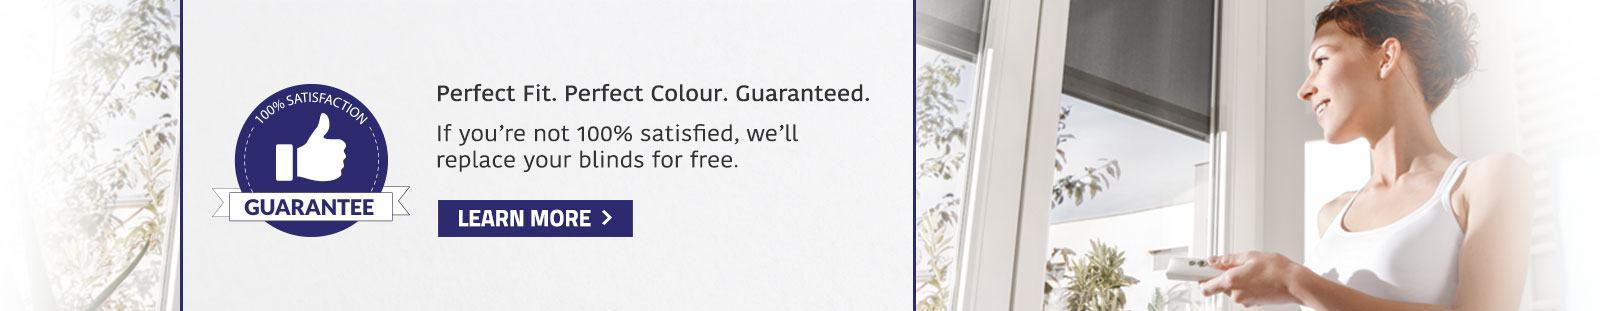 Perfect fit. Perfect colour. Guaranteed.